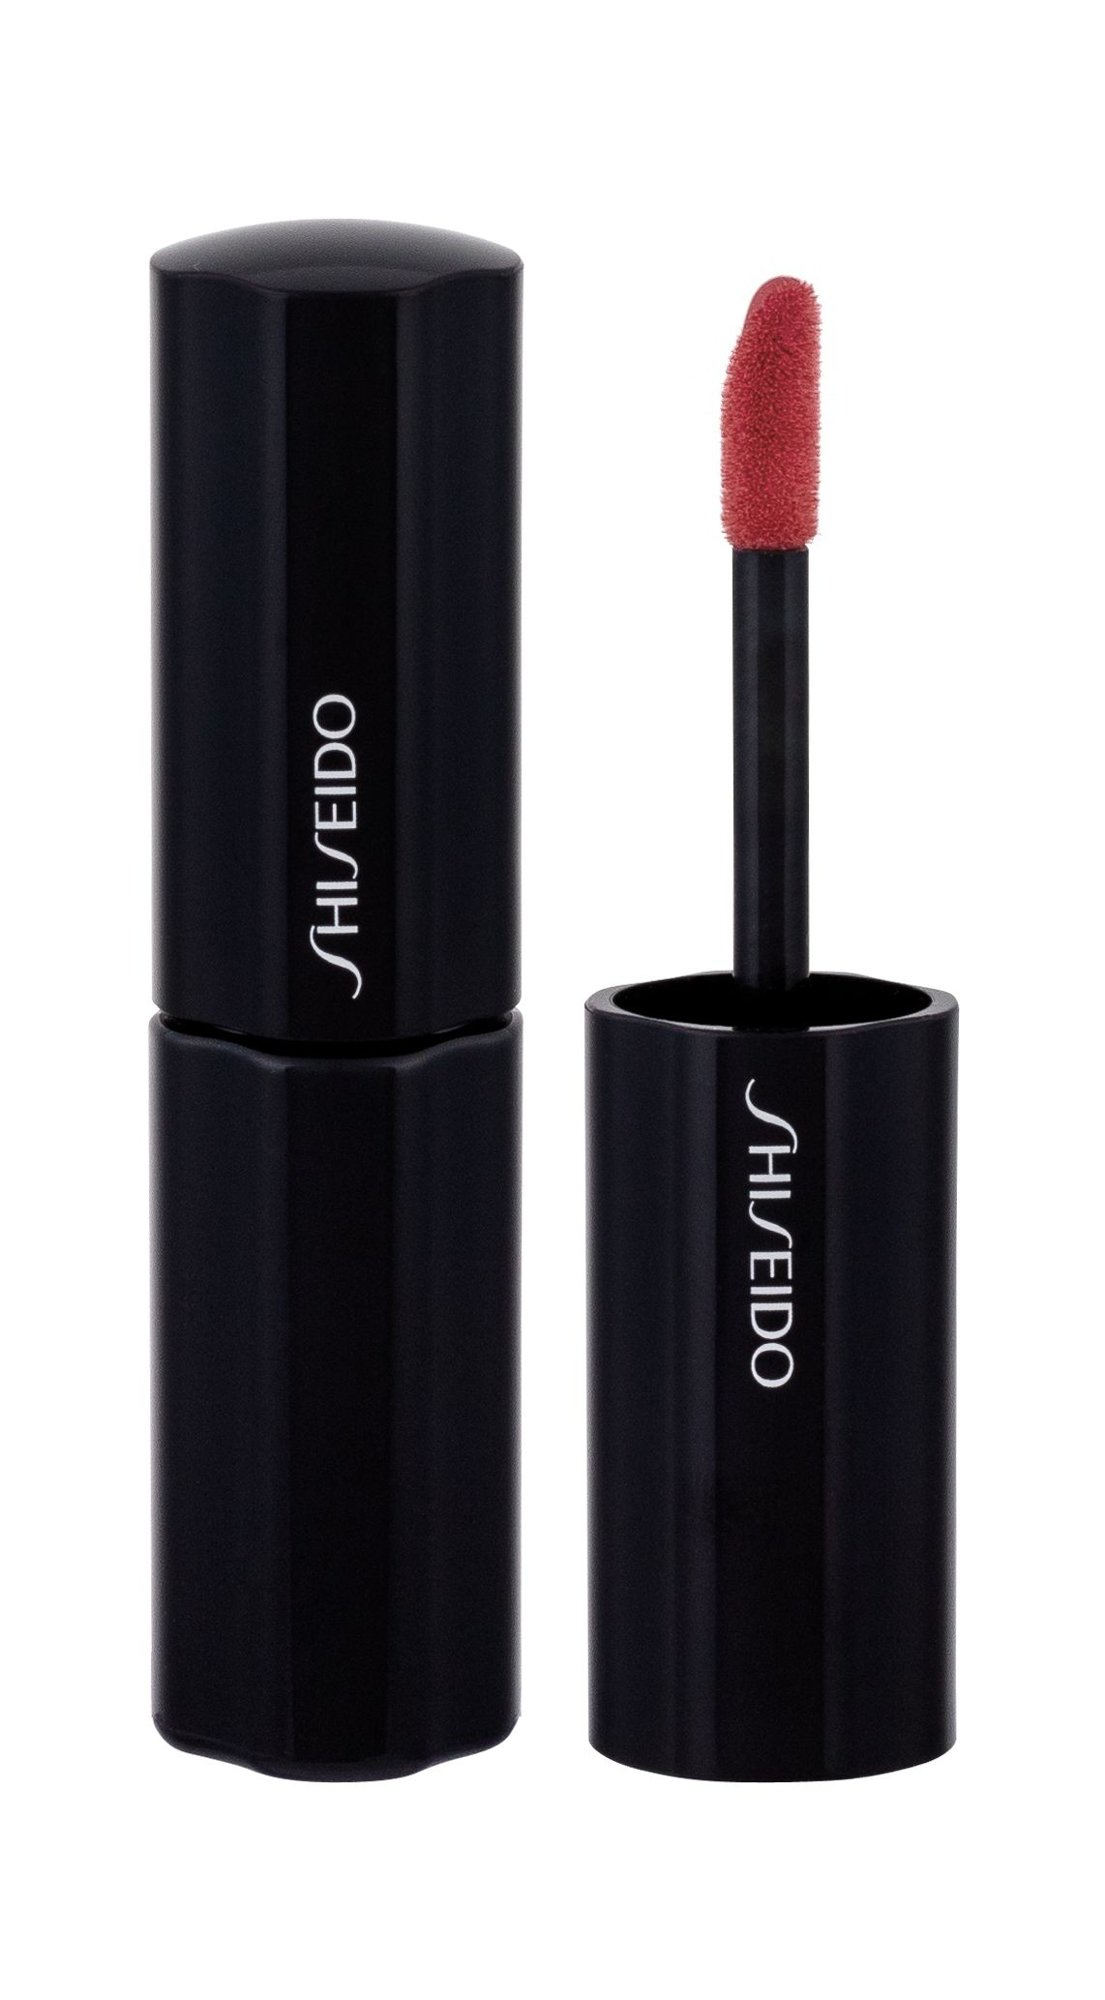 Shiseido Lacquer Rouge Lipstick 6ml RD305